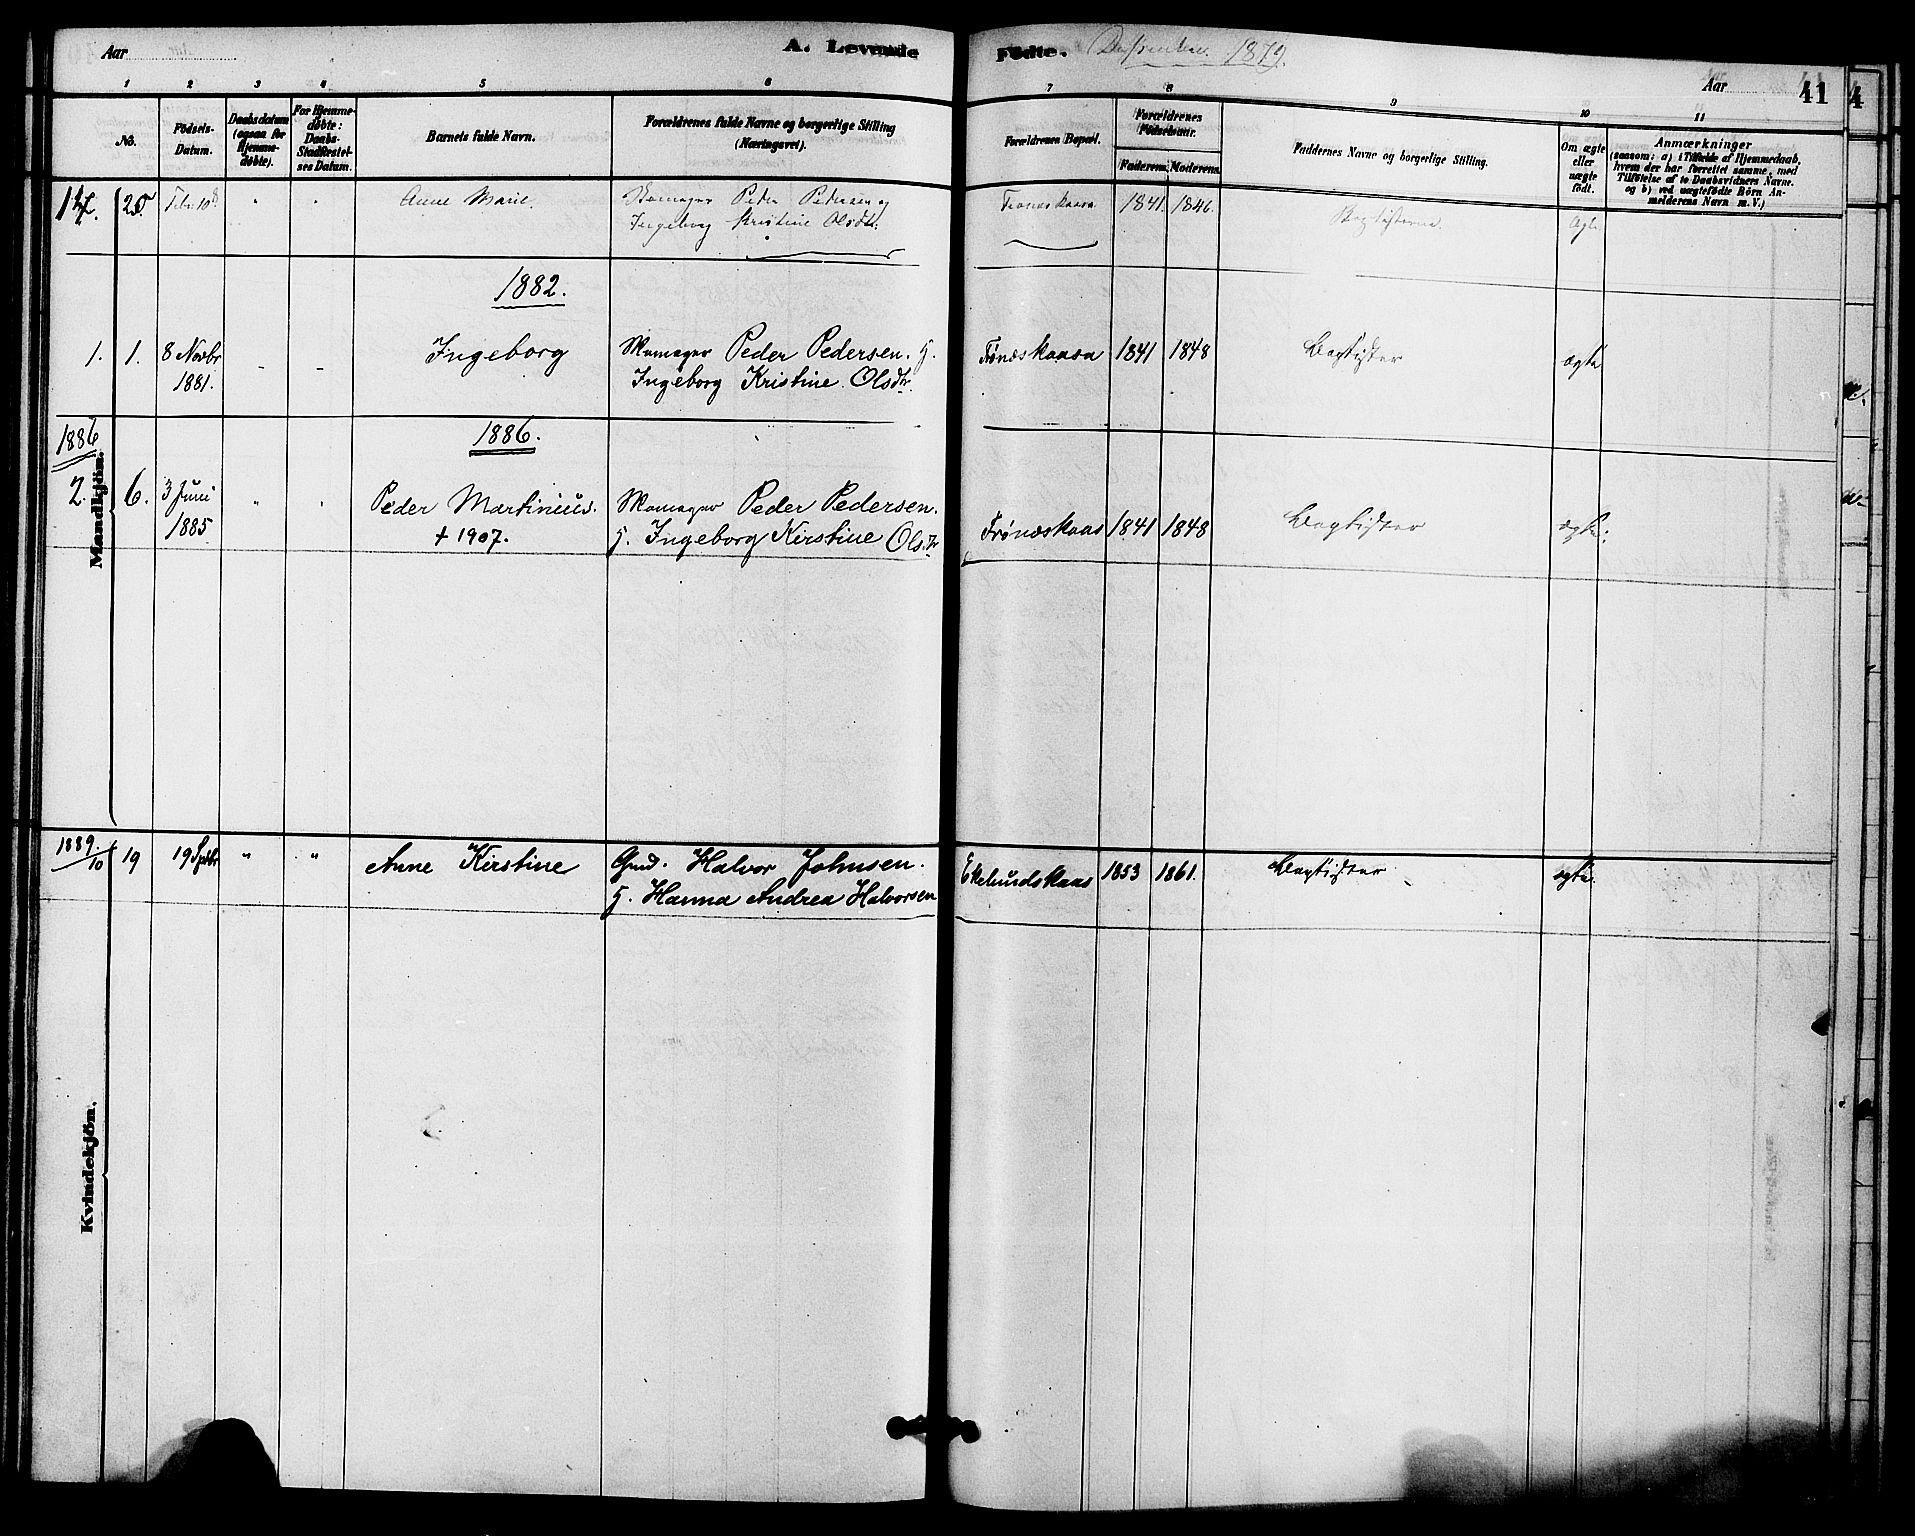 SAKO, Solum kirkebøker, F/Fc/L0001: Ministerialbok nr. III 1, 1877-1891, s. 41